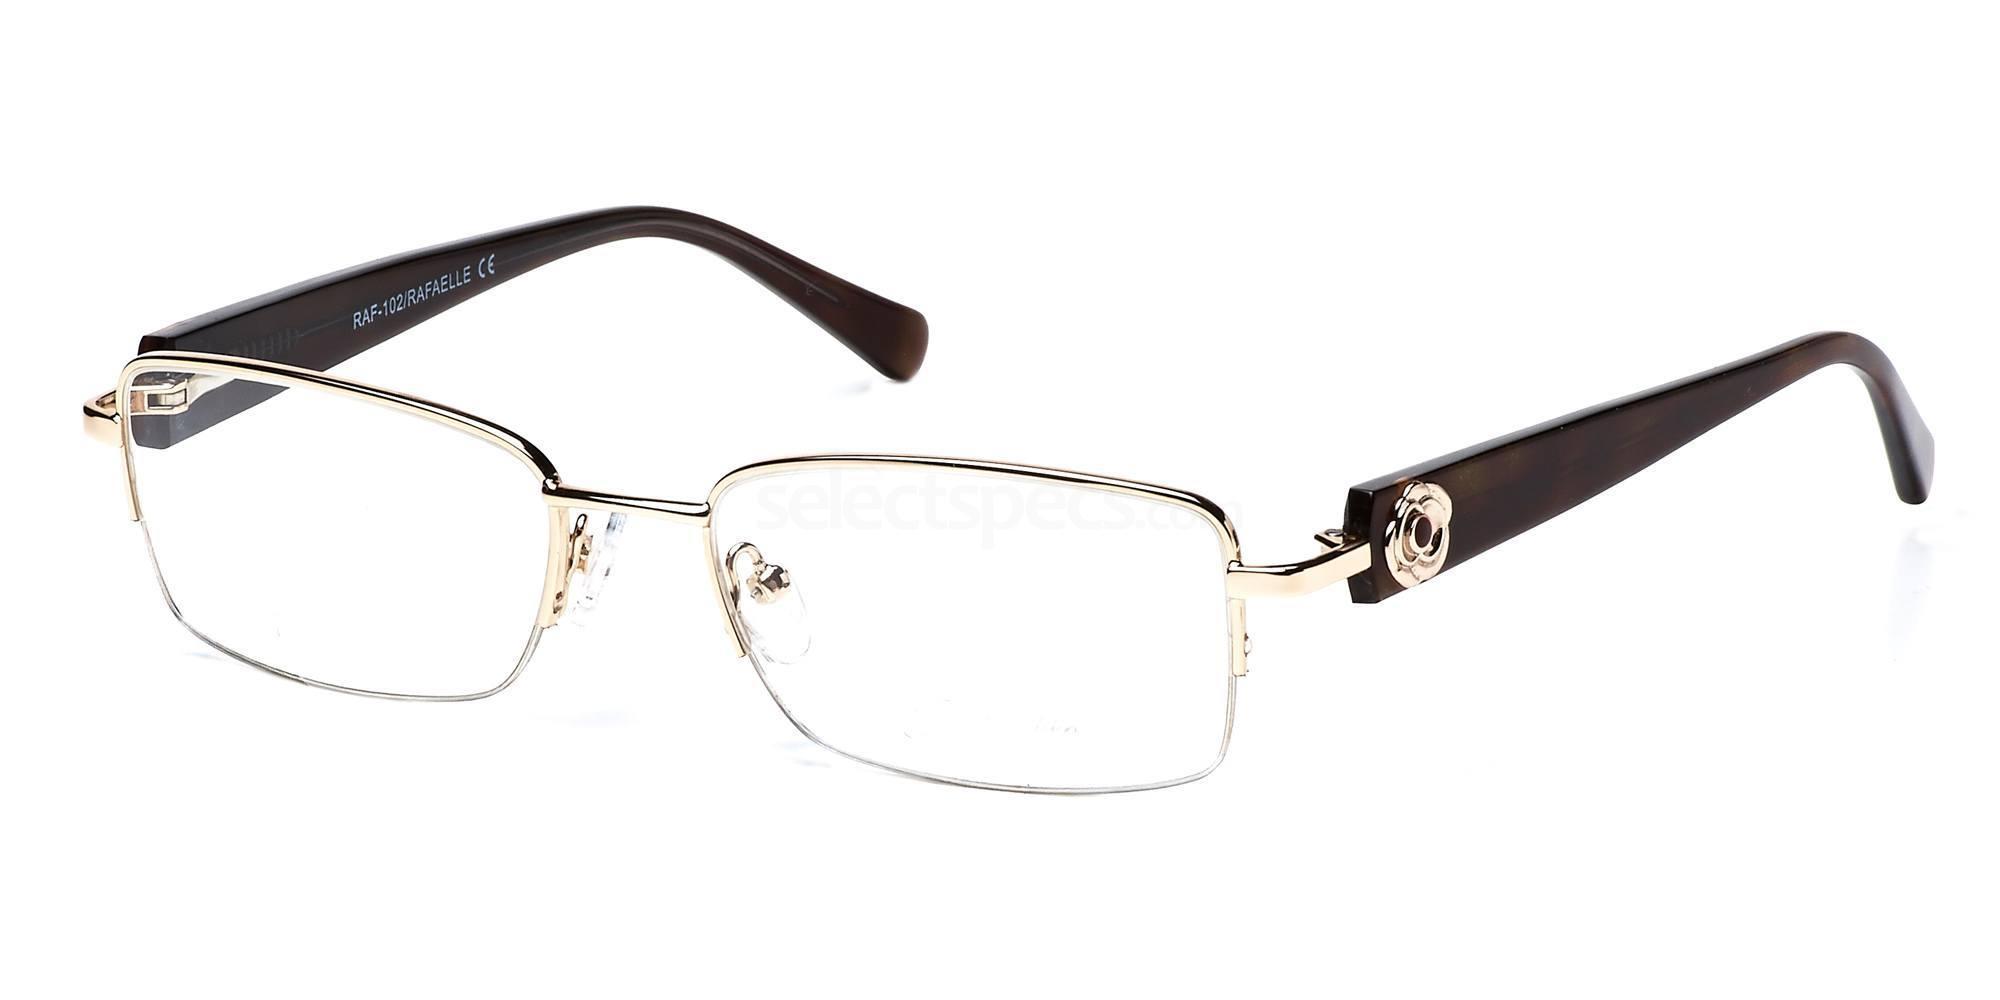 C1 RAF102 Glasses, Rafaelle